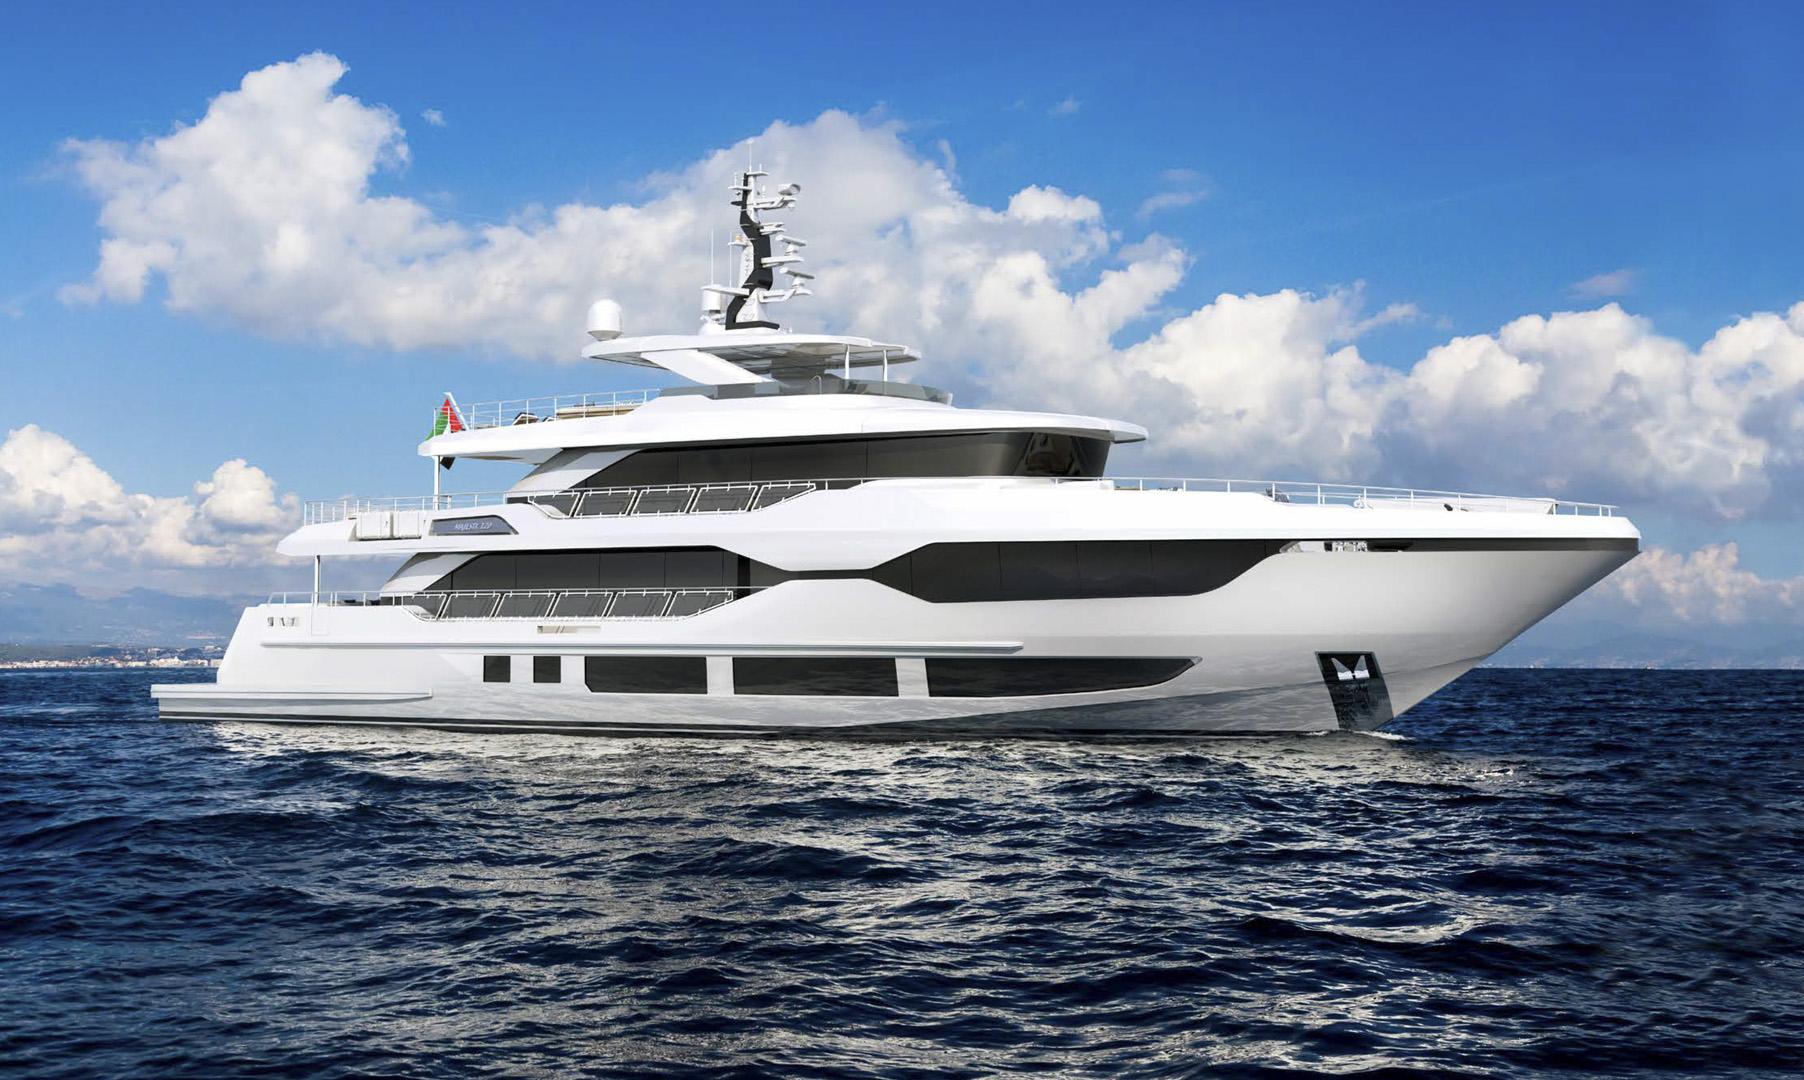 Majesty 120 - Latest addition to the Majesty Yachts Superyacht Collection